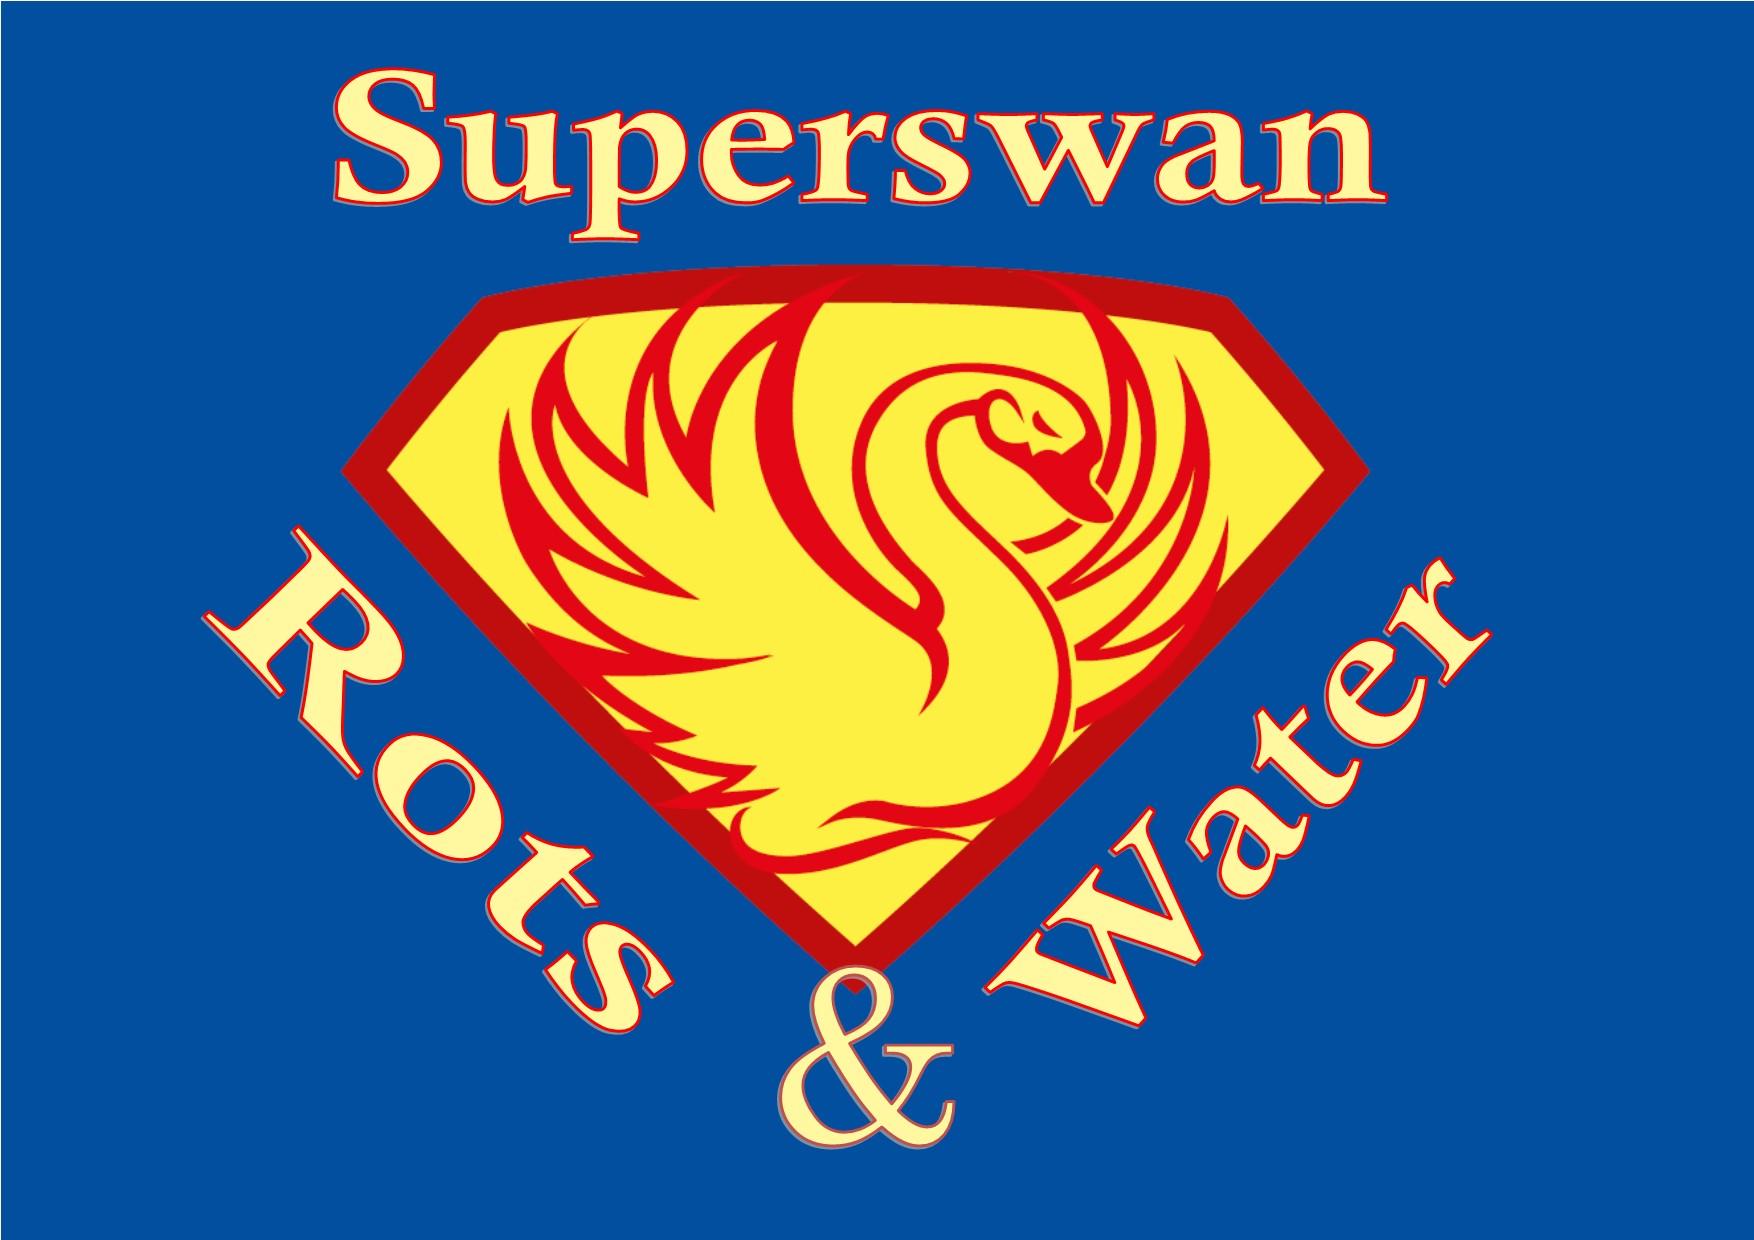 superswan-rw-logo